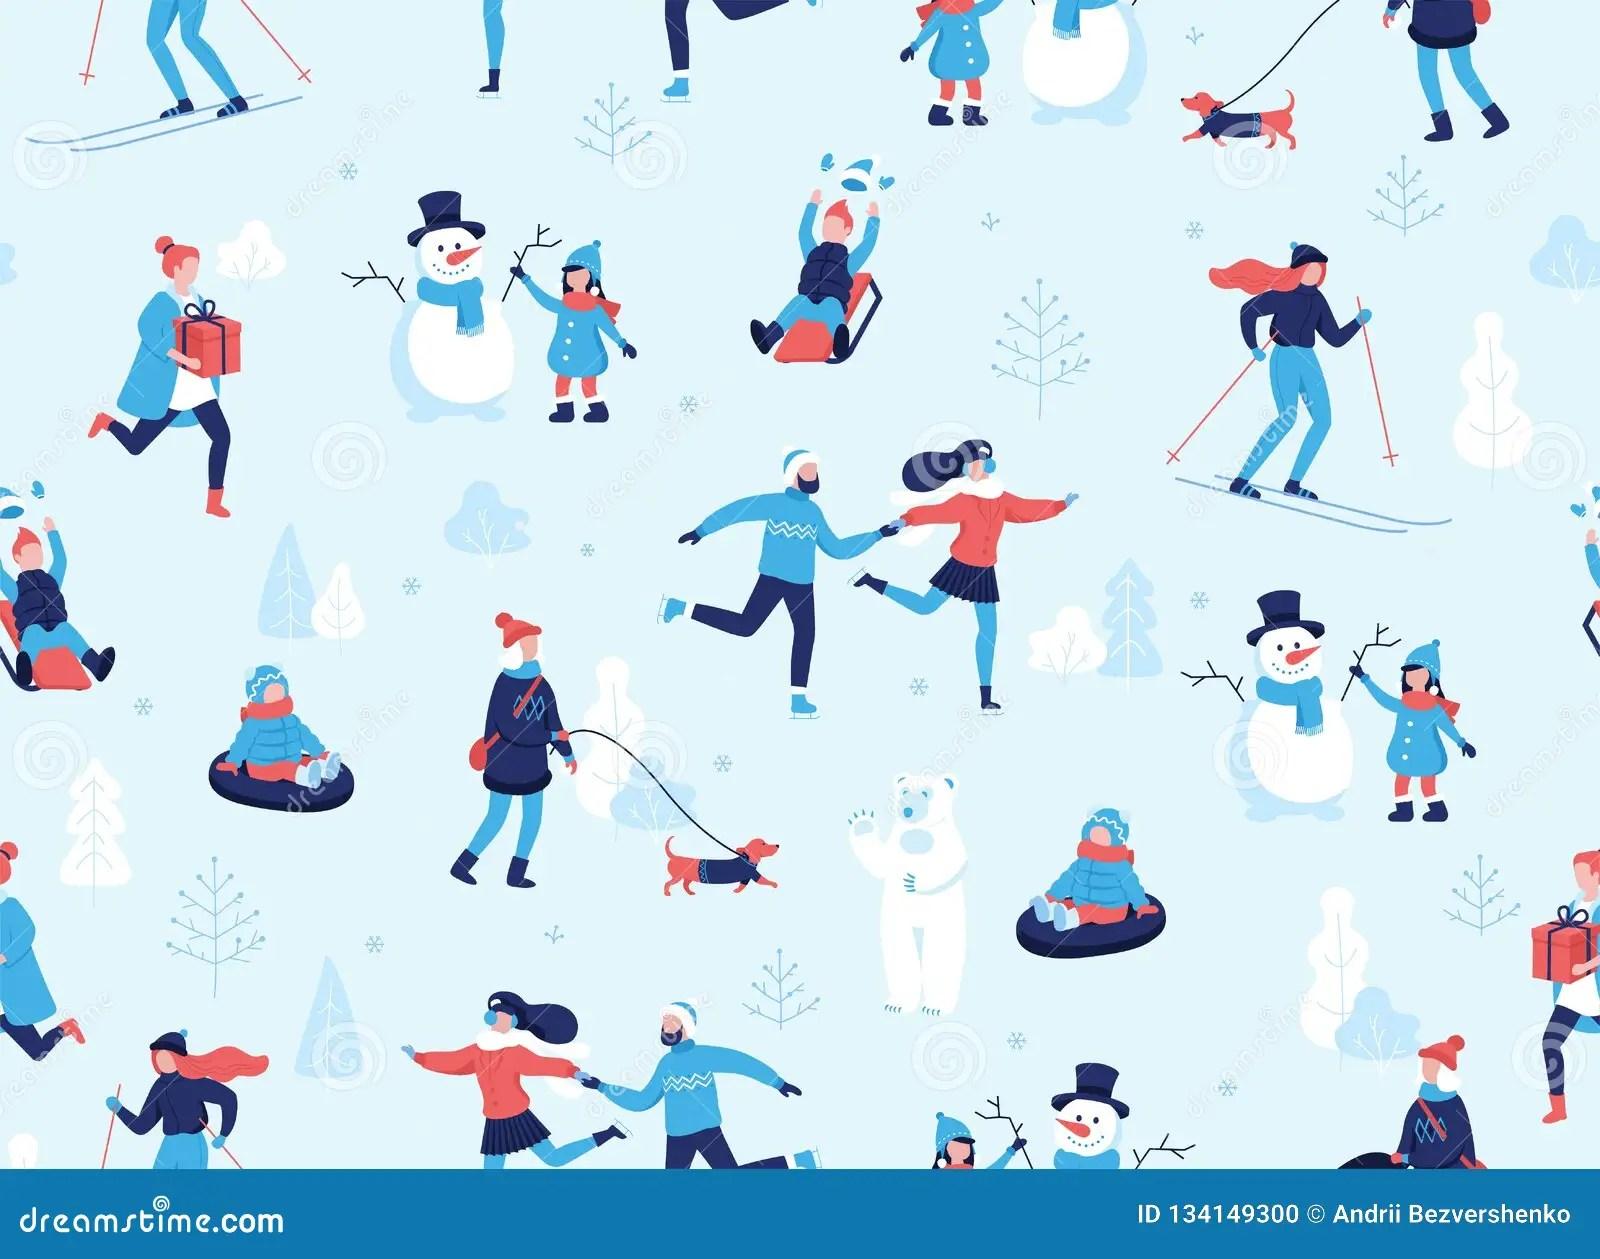 Winter Sports Outdoors Seamless Pattern People Having Fun